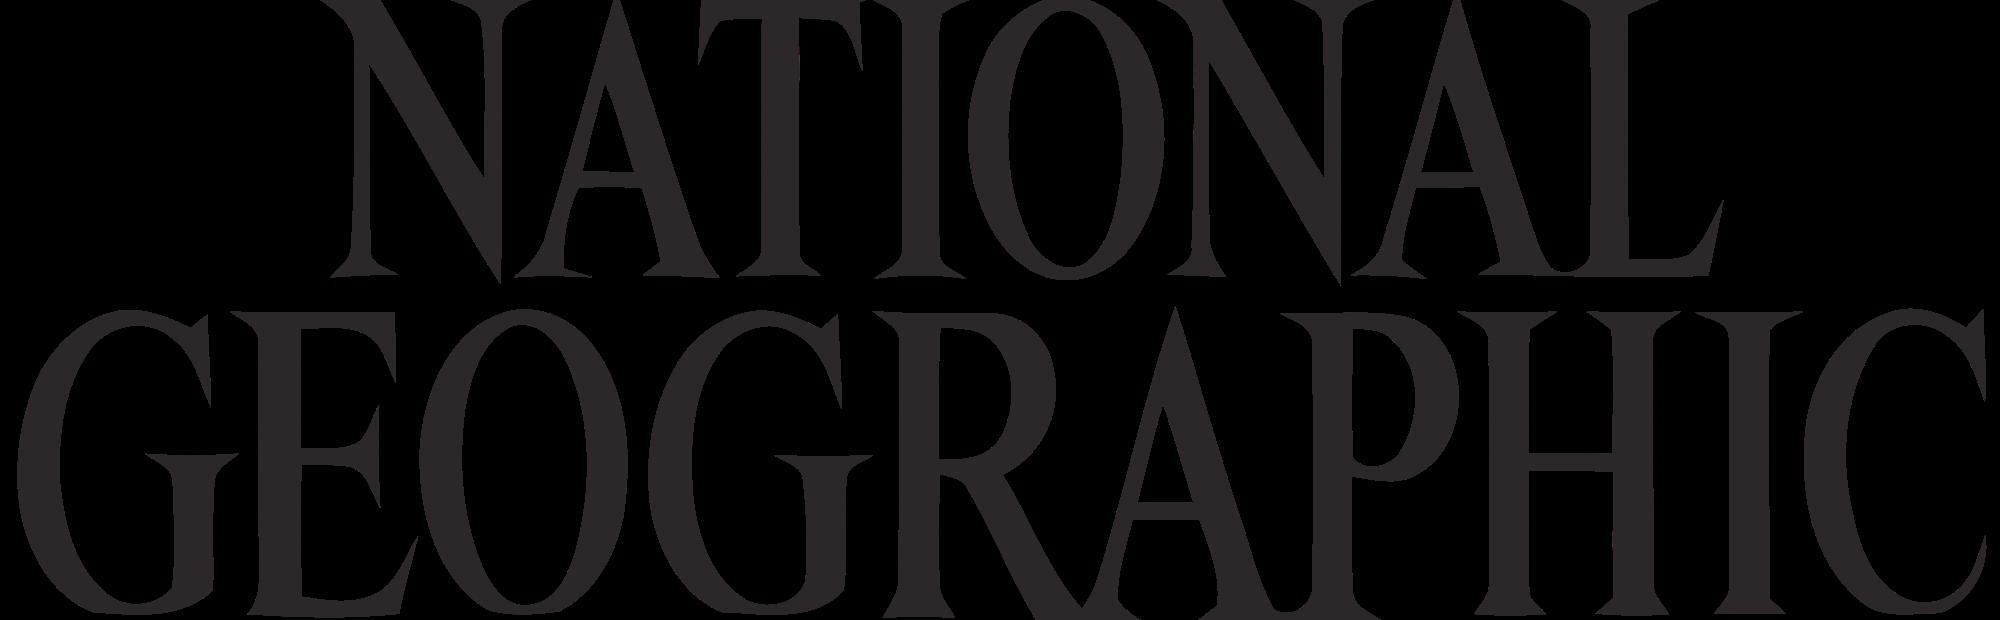 Nat Geo Logo Vector PNG - 29219